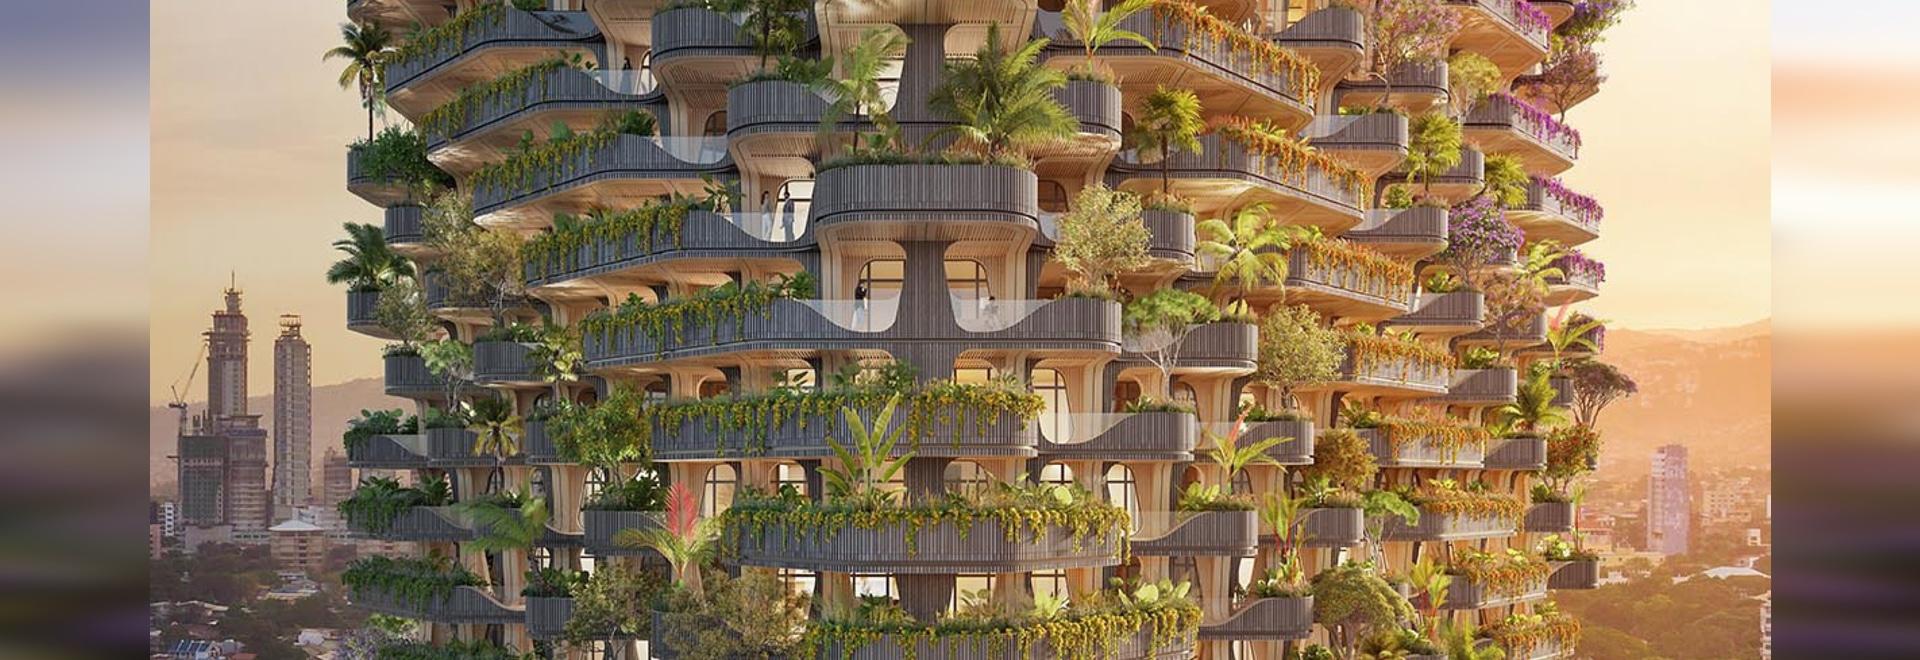 Vincent Callebaut Architectures progetta la torre residenziale Rainbow Tree nelle Filippine